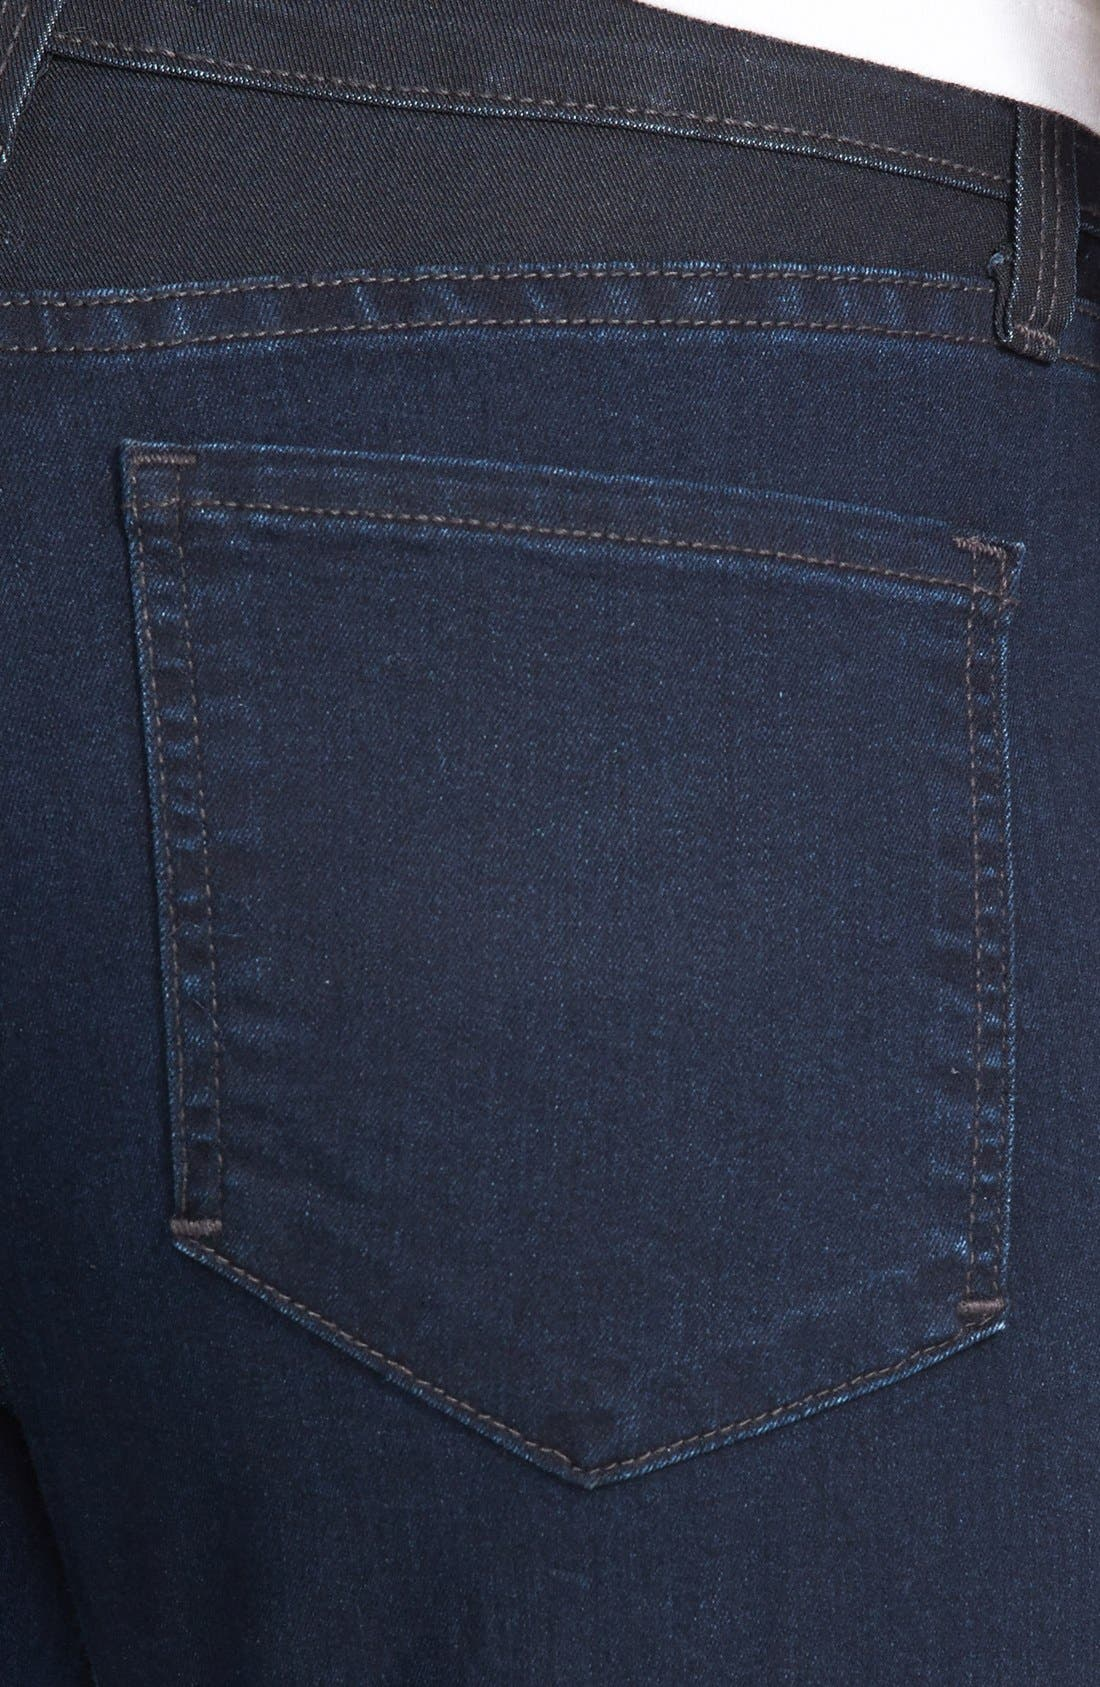 Alternate Image 3  - NYDJ 'Alexandra' Tuxedo Stripe Stretch Skinny Jeans (Covina)